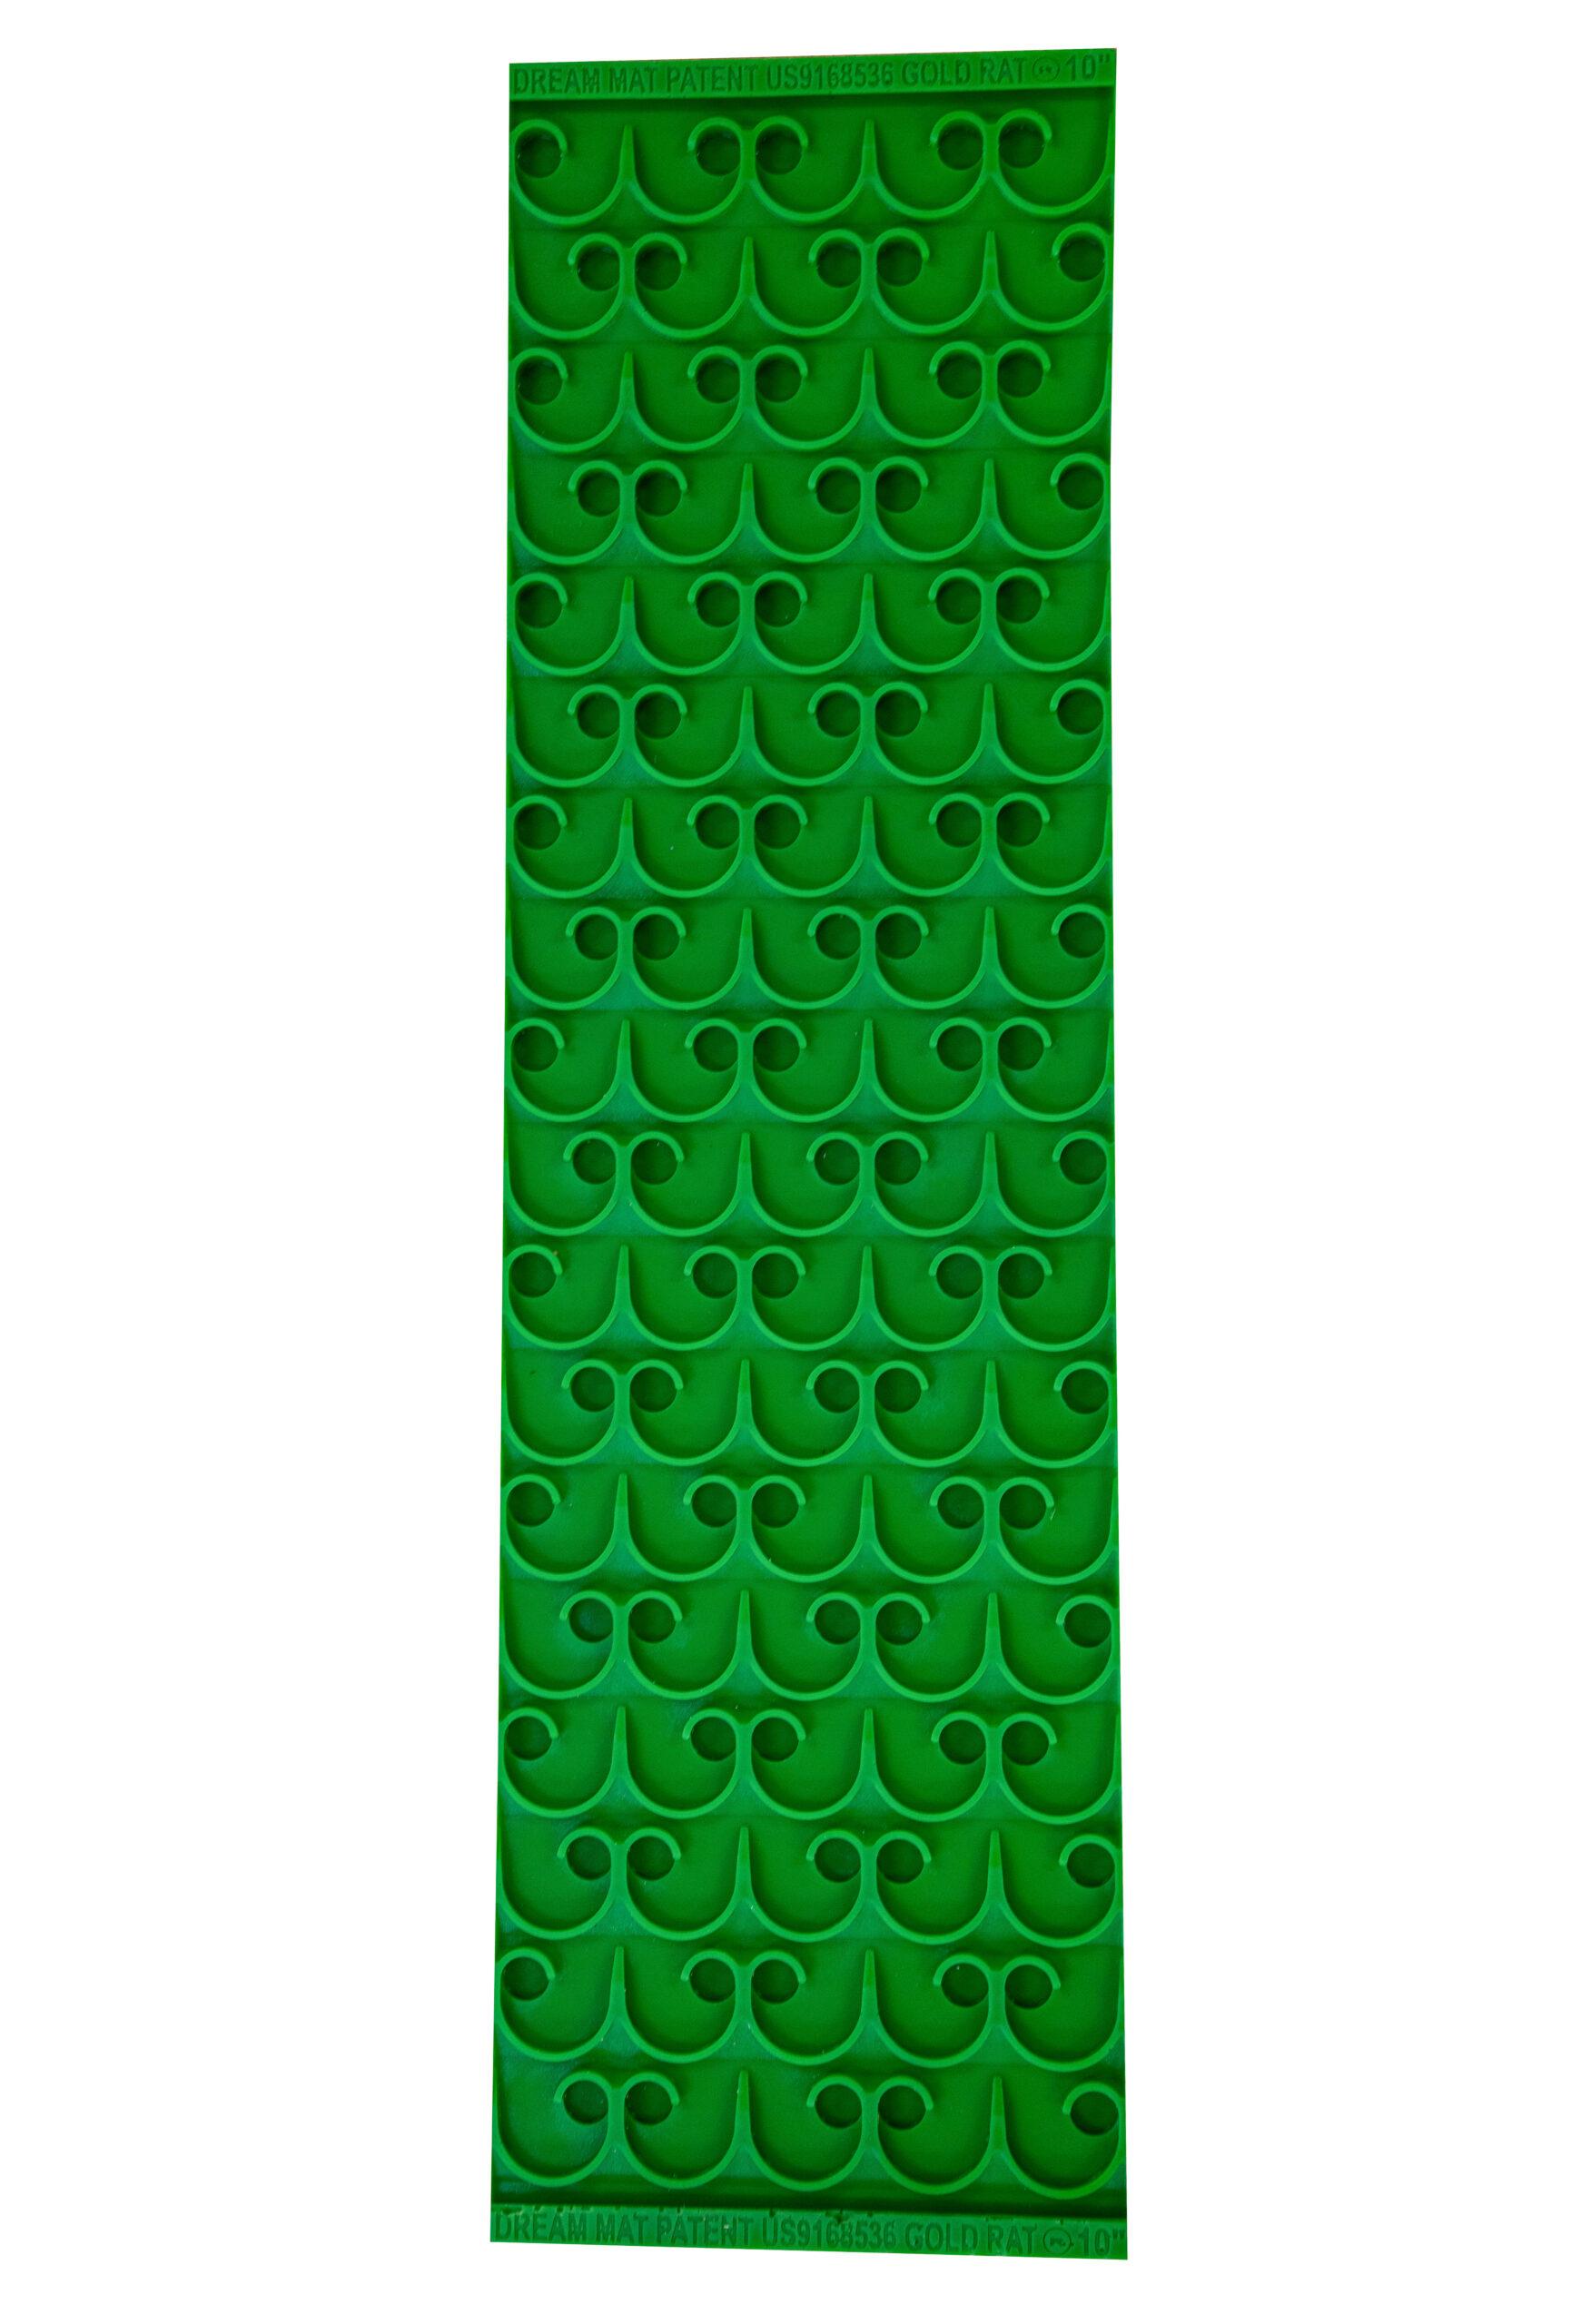 286A3653-2